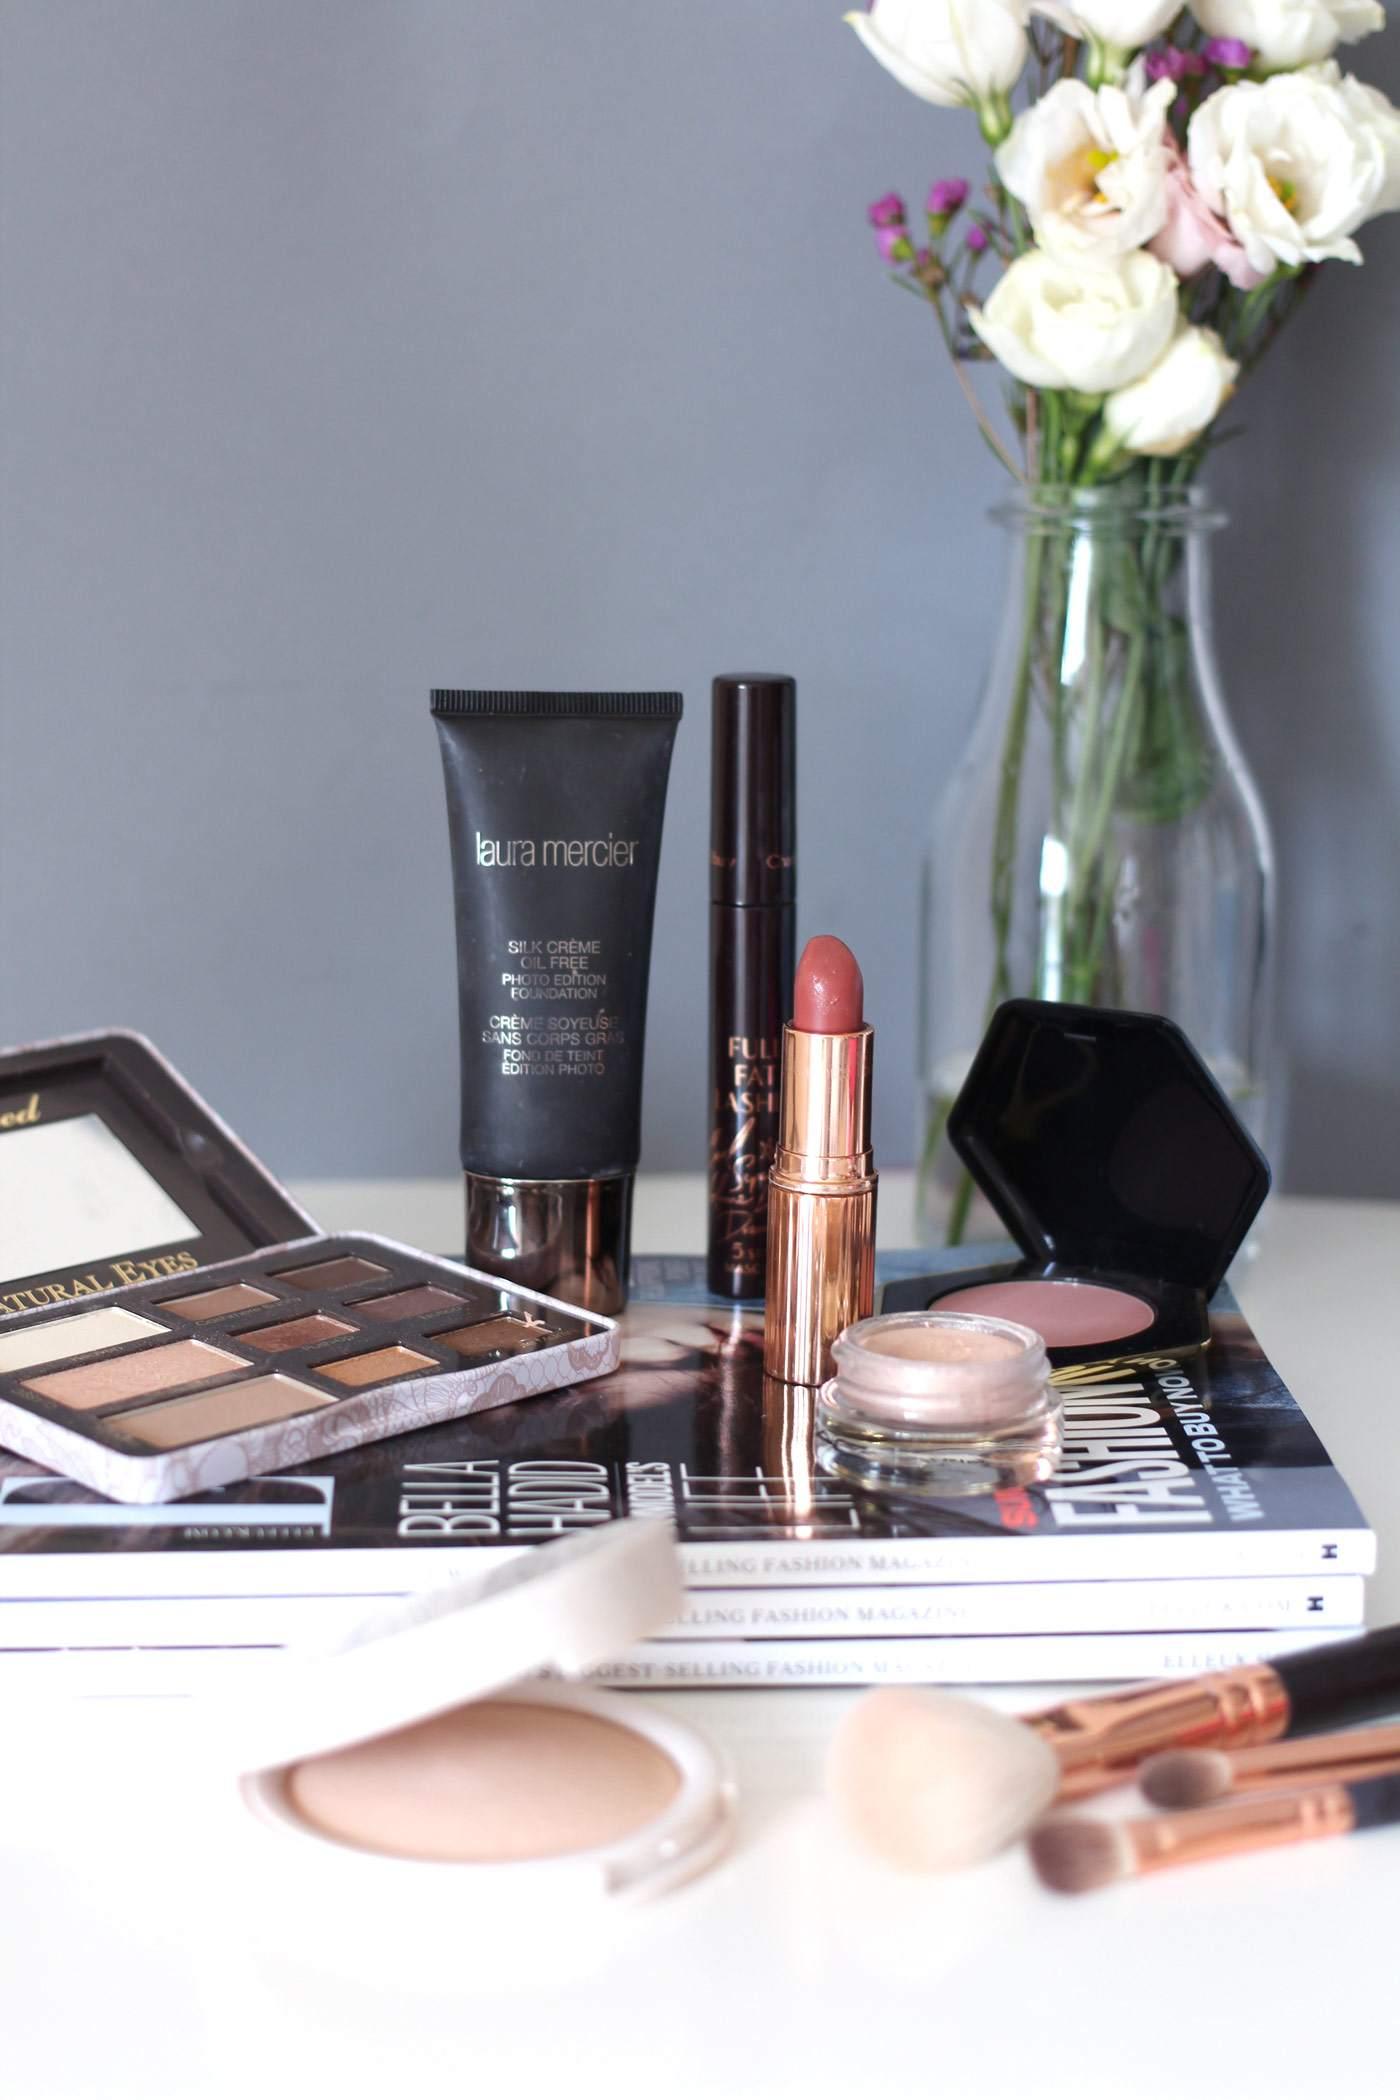 makeup-favourites-charlotte-tilbury-laura-mercier-too-faced